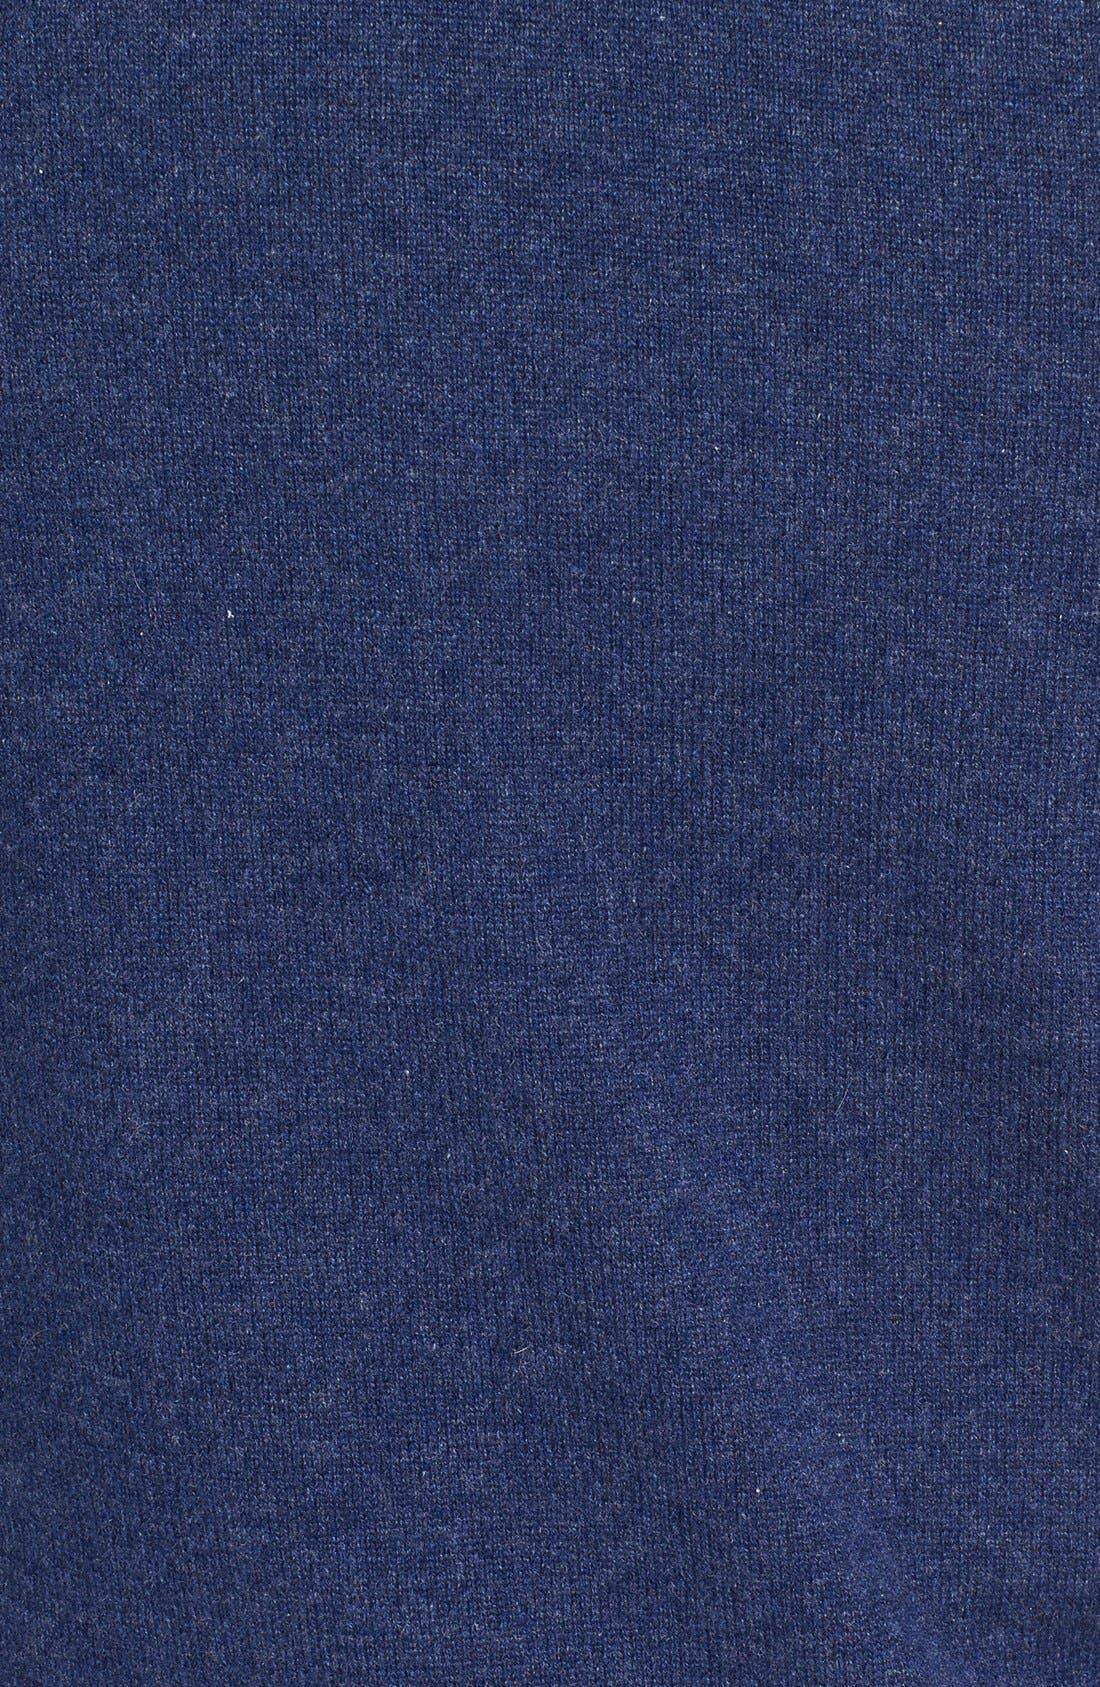 Cashmere V-Neck Sweater Vest,                             Alternate thumbnail 10, color,                             420